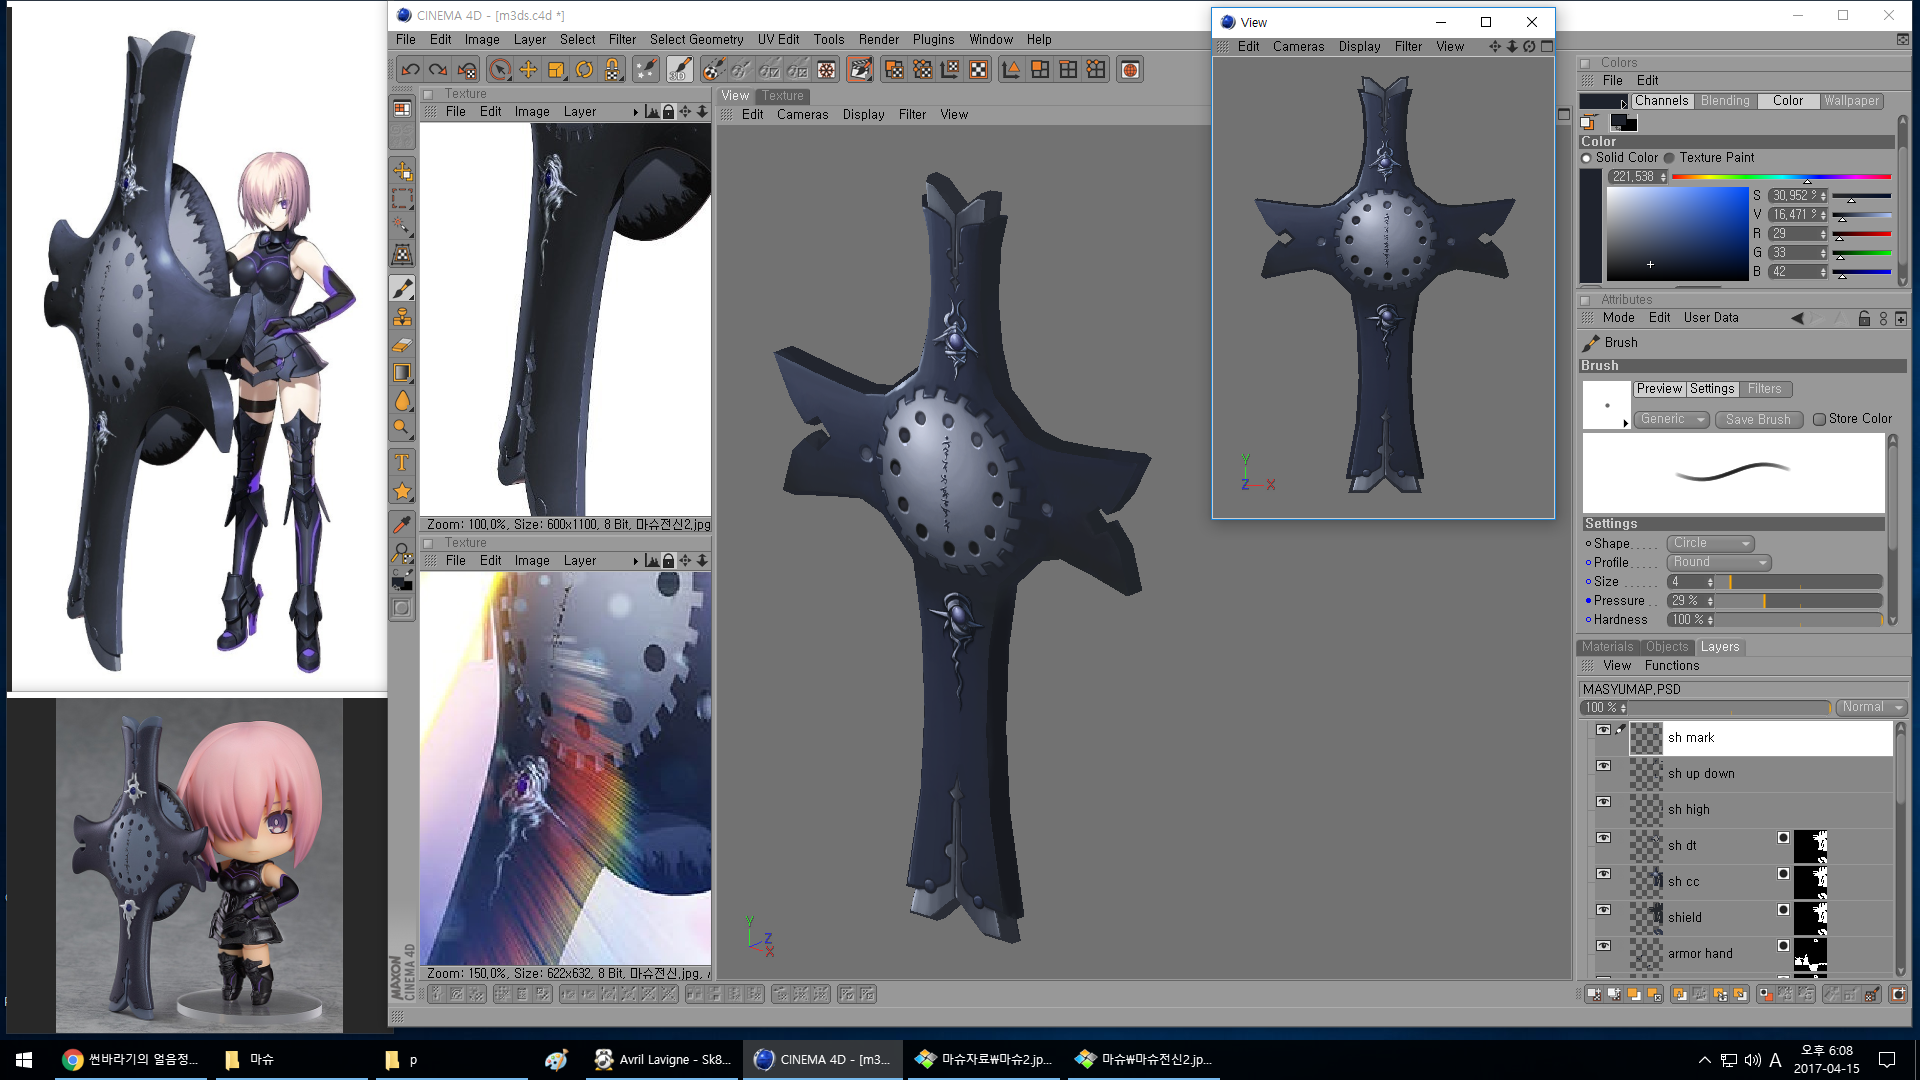 [3D] SD 마슈 작업일지 - 방패 손맵2 (170415)